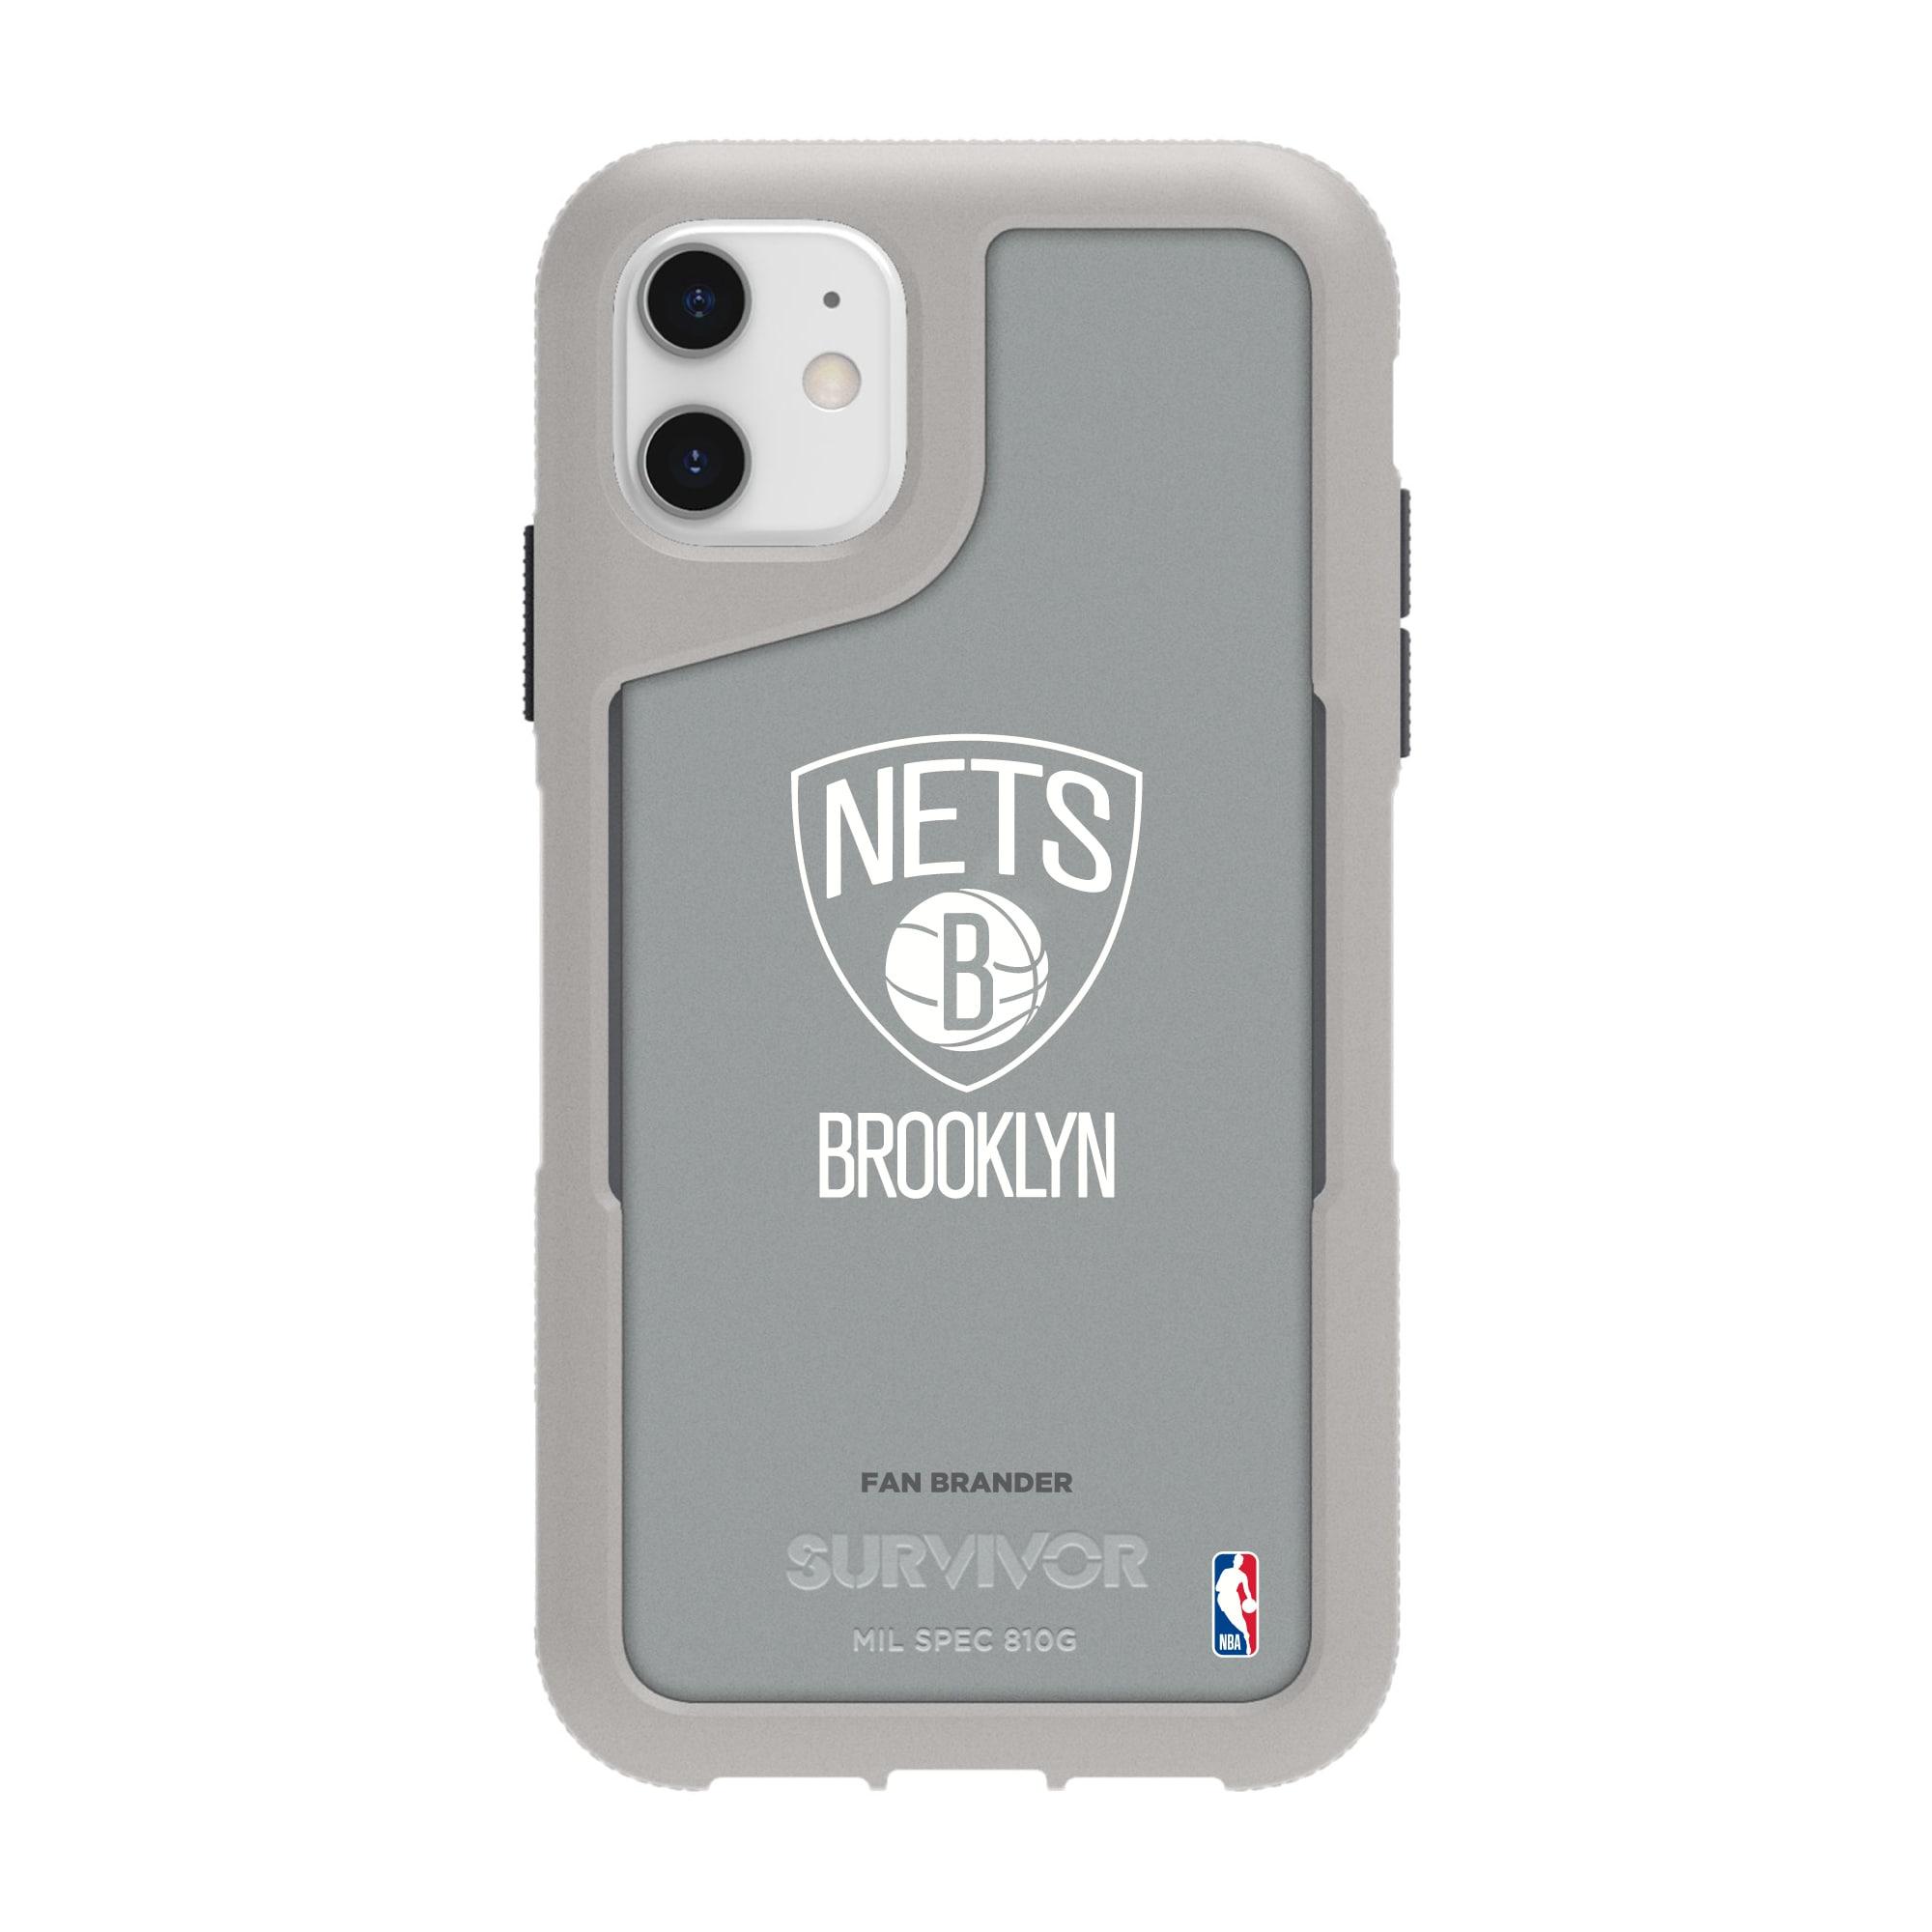 Brooklyn Nets Griffin Survivor Endurance iPhone Case - Gray